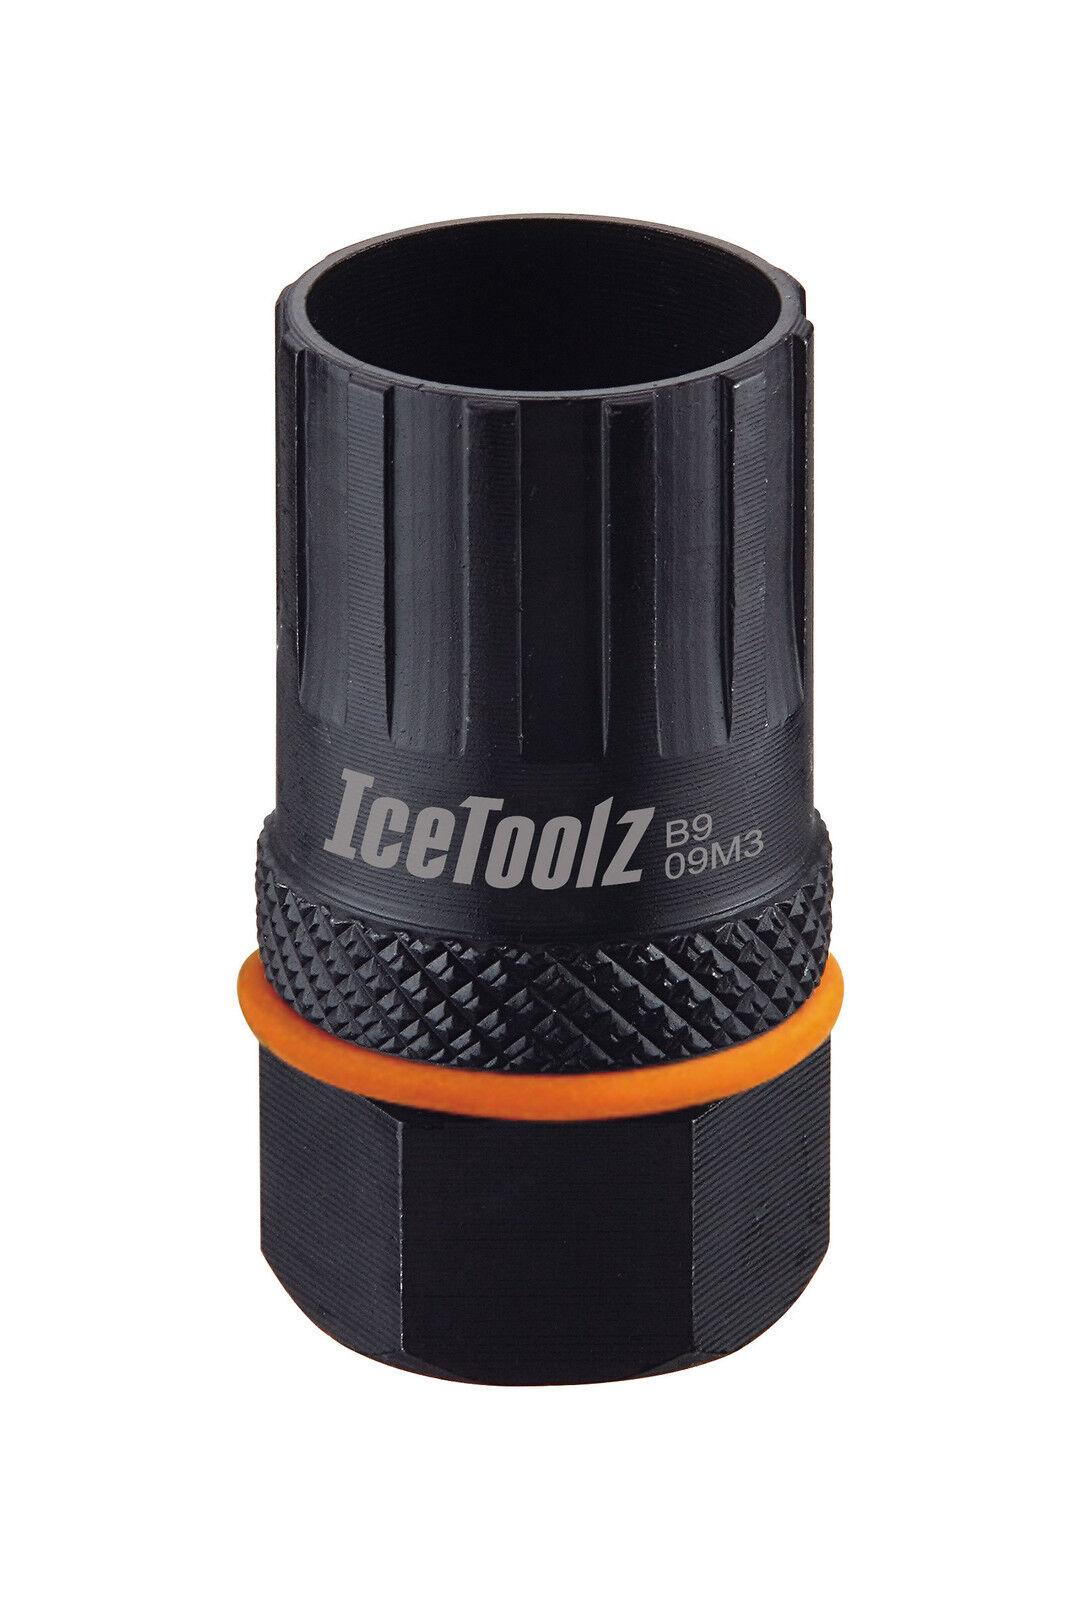 Extractor Icetoolz Compatible para Piñon Piñones Cassette MICHE Bicicleta 3972